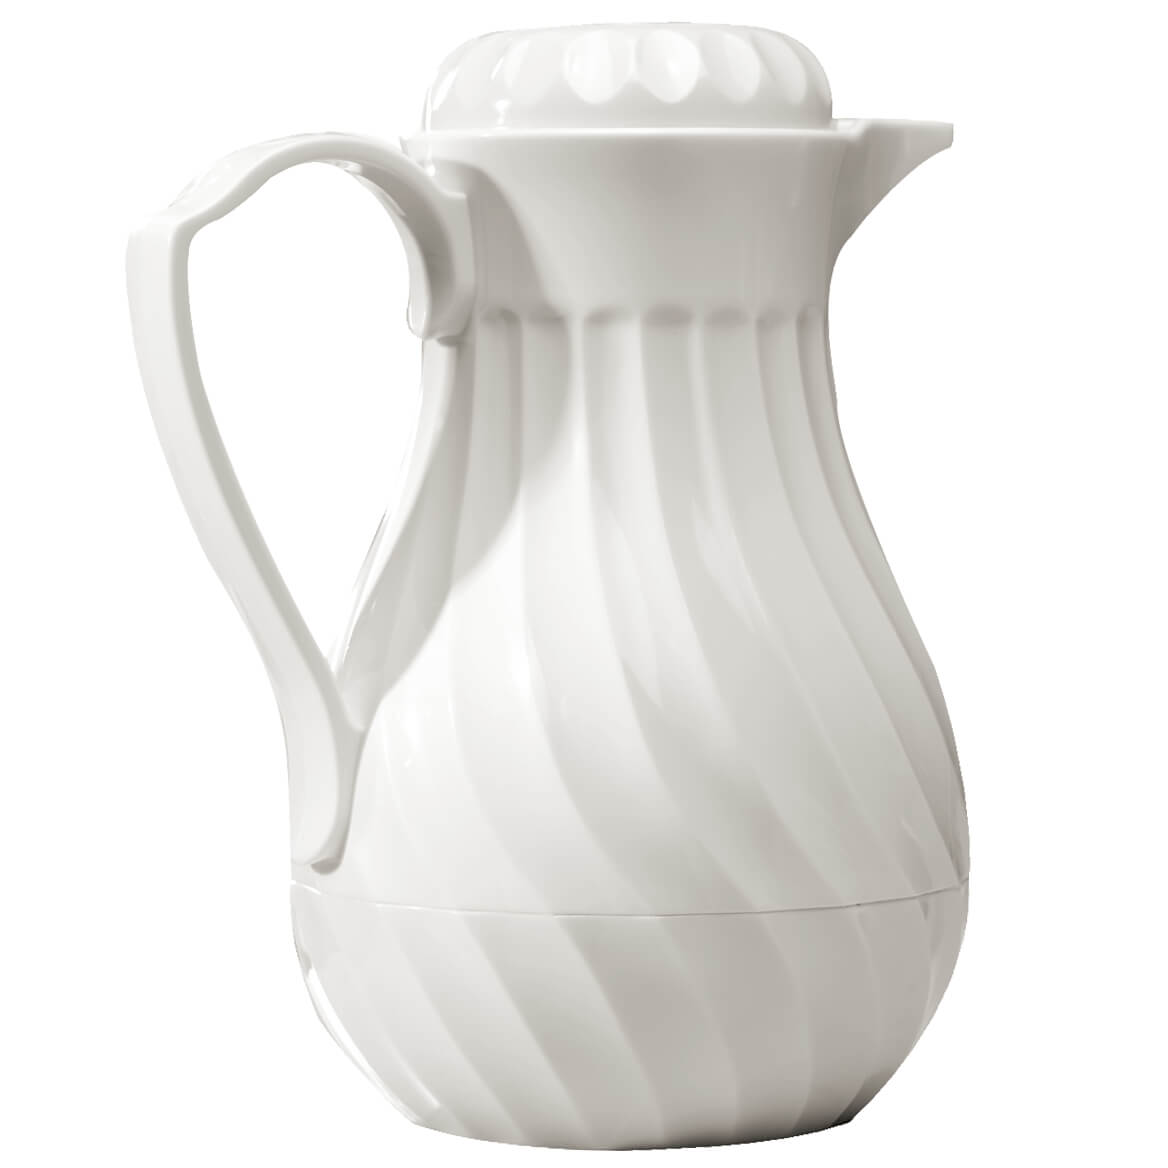 Forexpros coffee carafe khurram shahzad arif habib investment